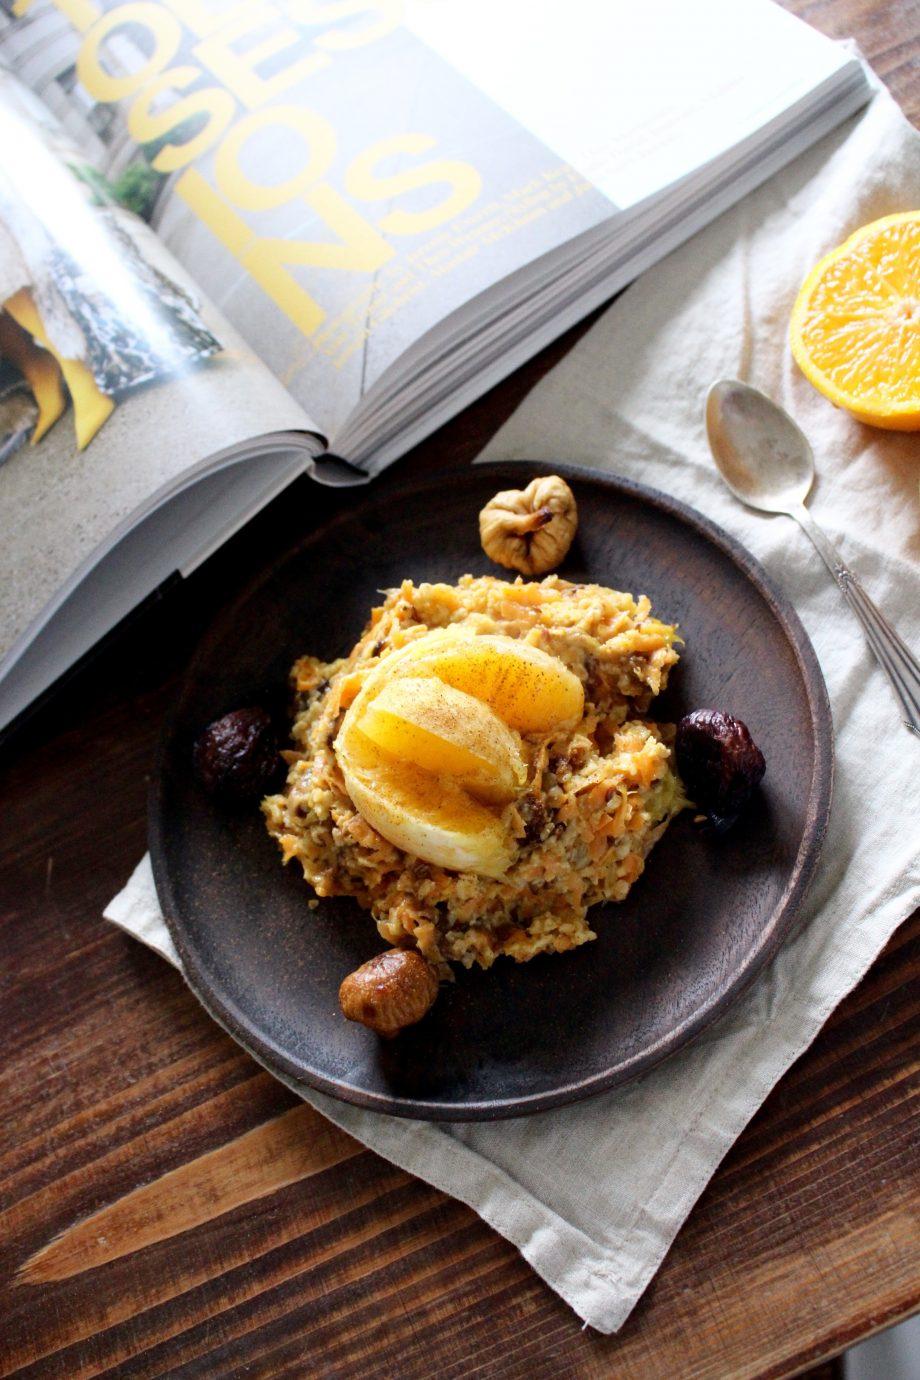 Karotten & Orangen Porridge |12.11.2017